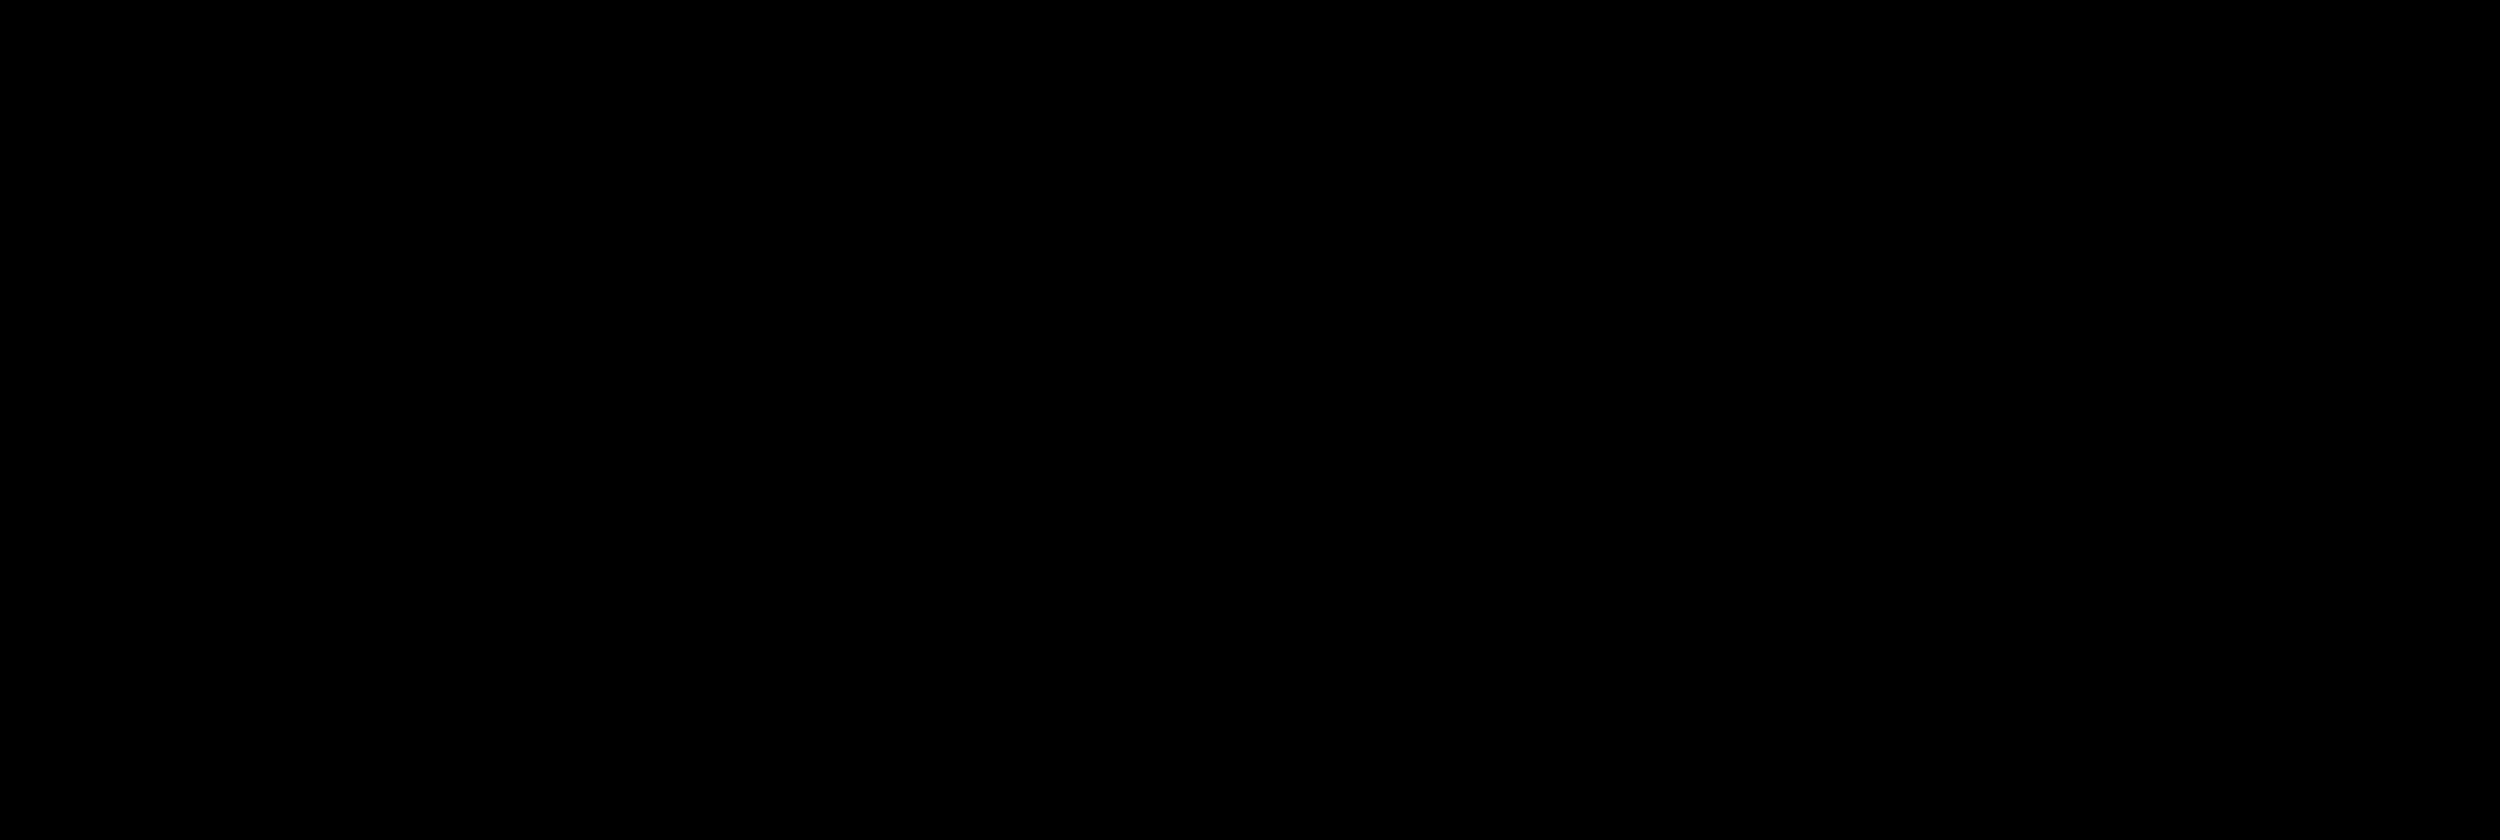 PAI Box Logo 2015.jpg.png